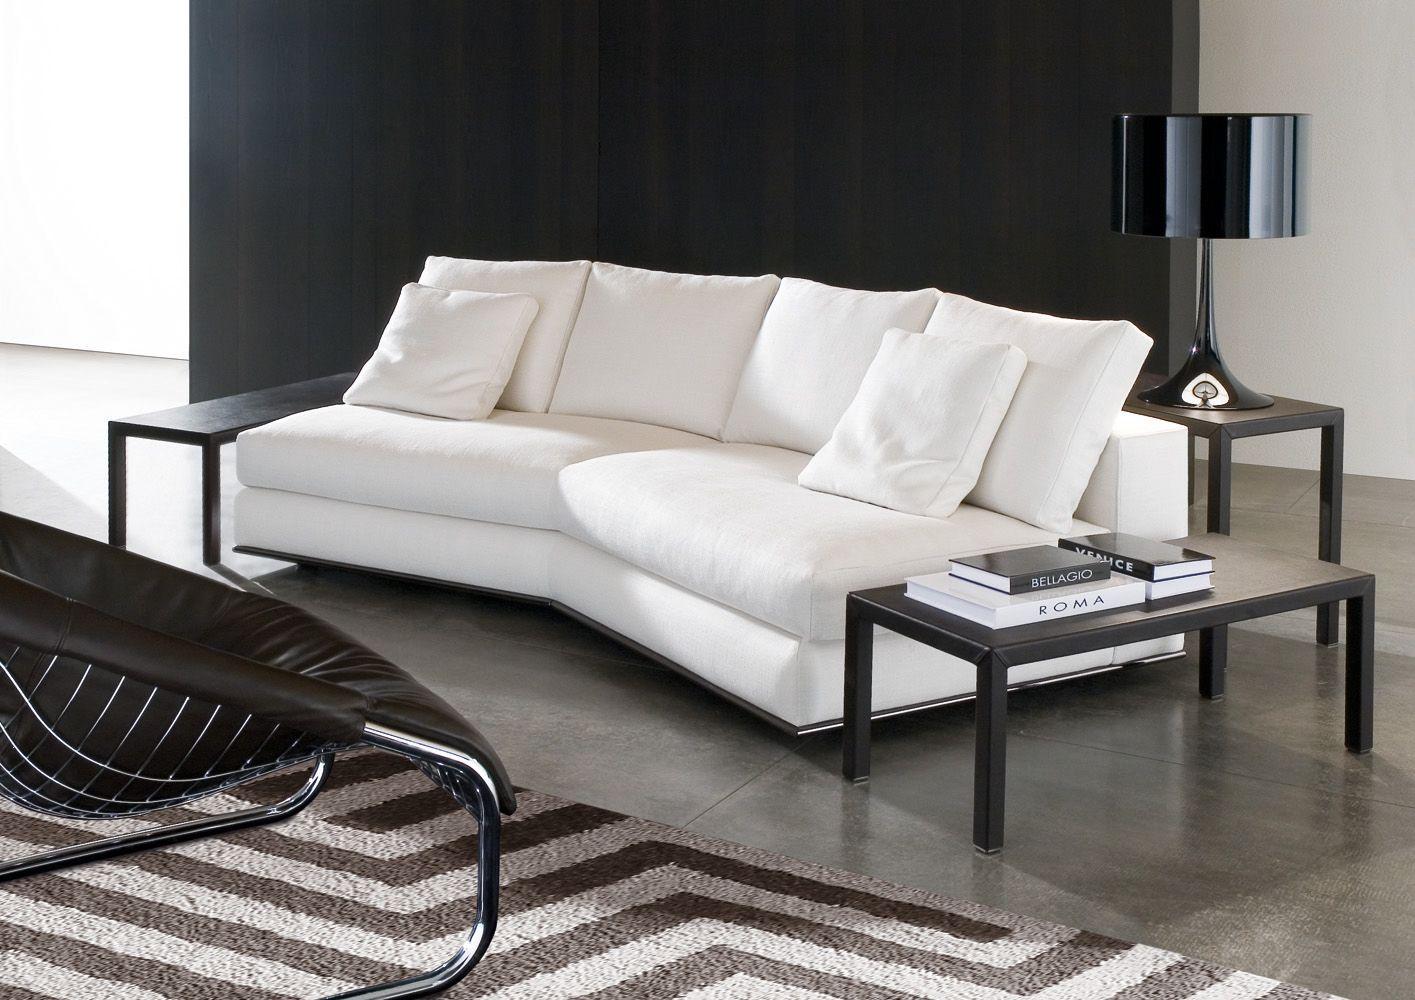 Minotti Sofas Australia Slipcover For Twin Sleeper Sofa Hamilton Co Van Der Horst Clementina